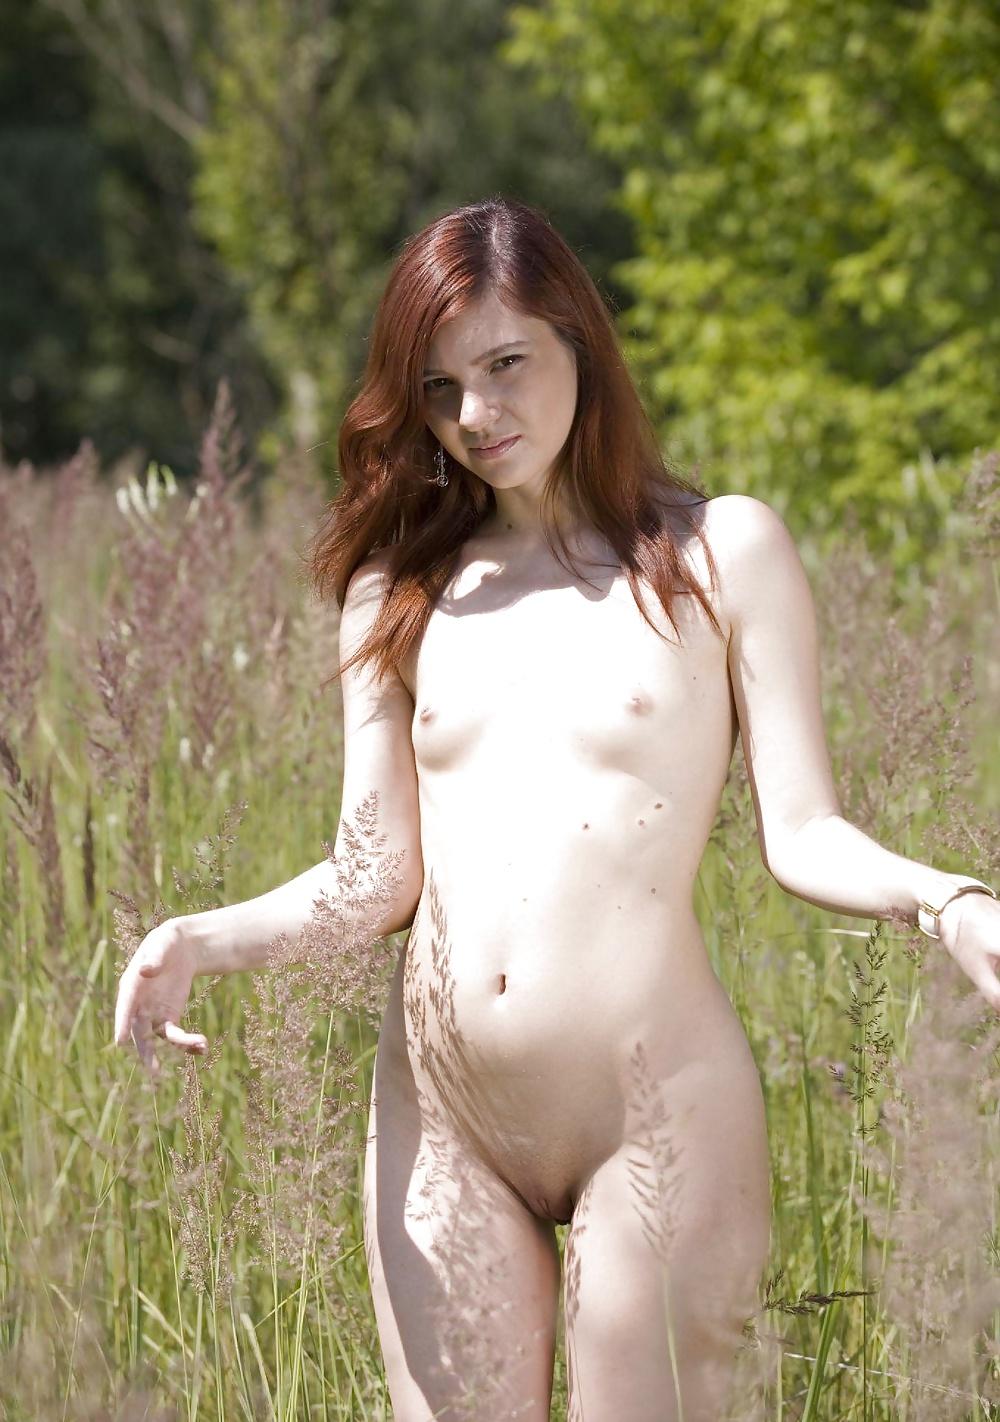 Sexy Nudest Nudes Gif